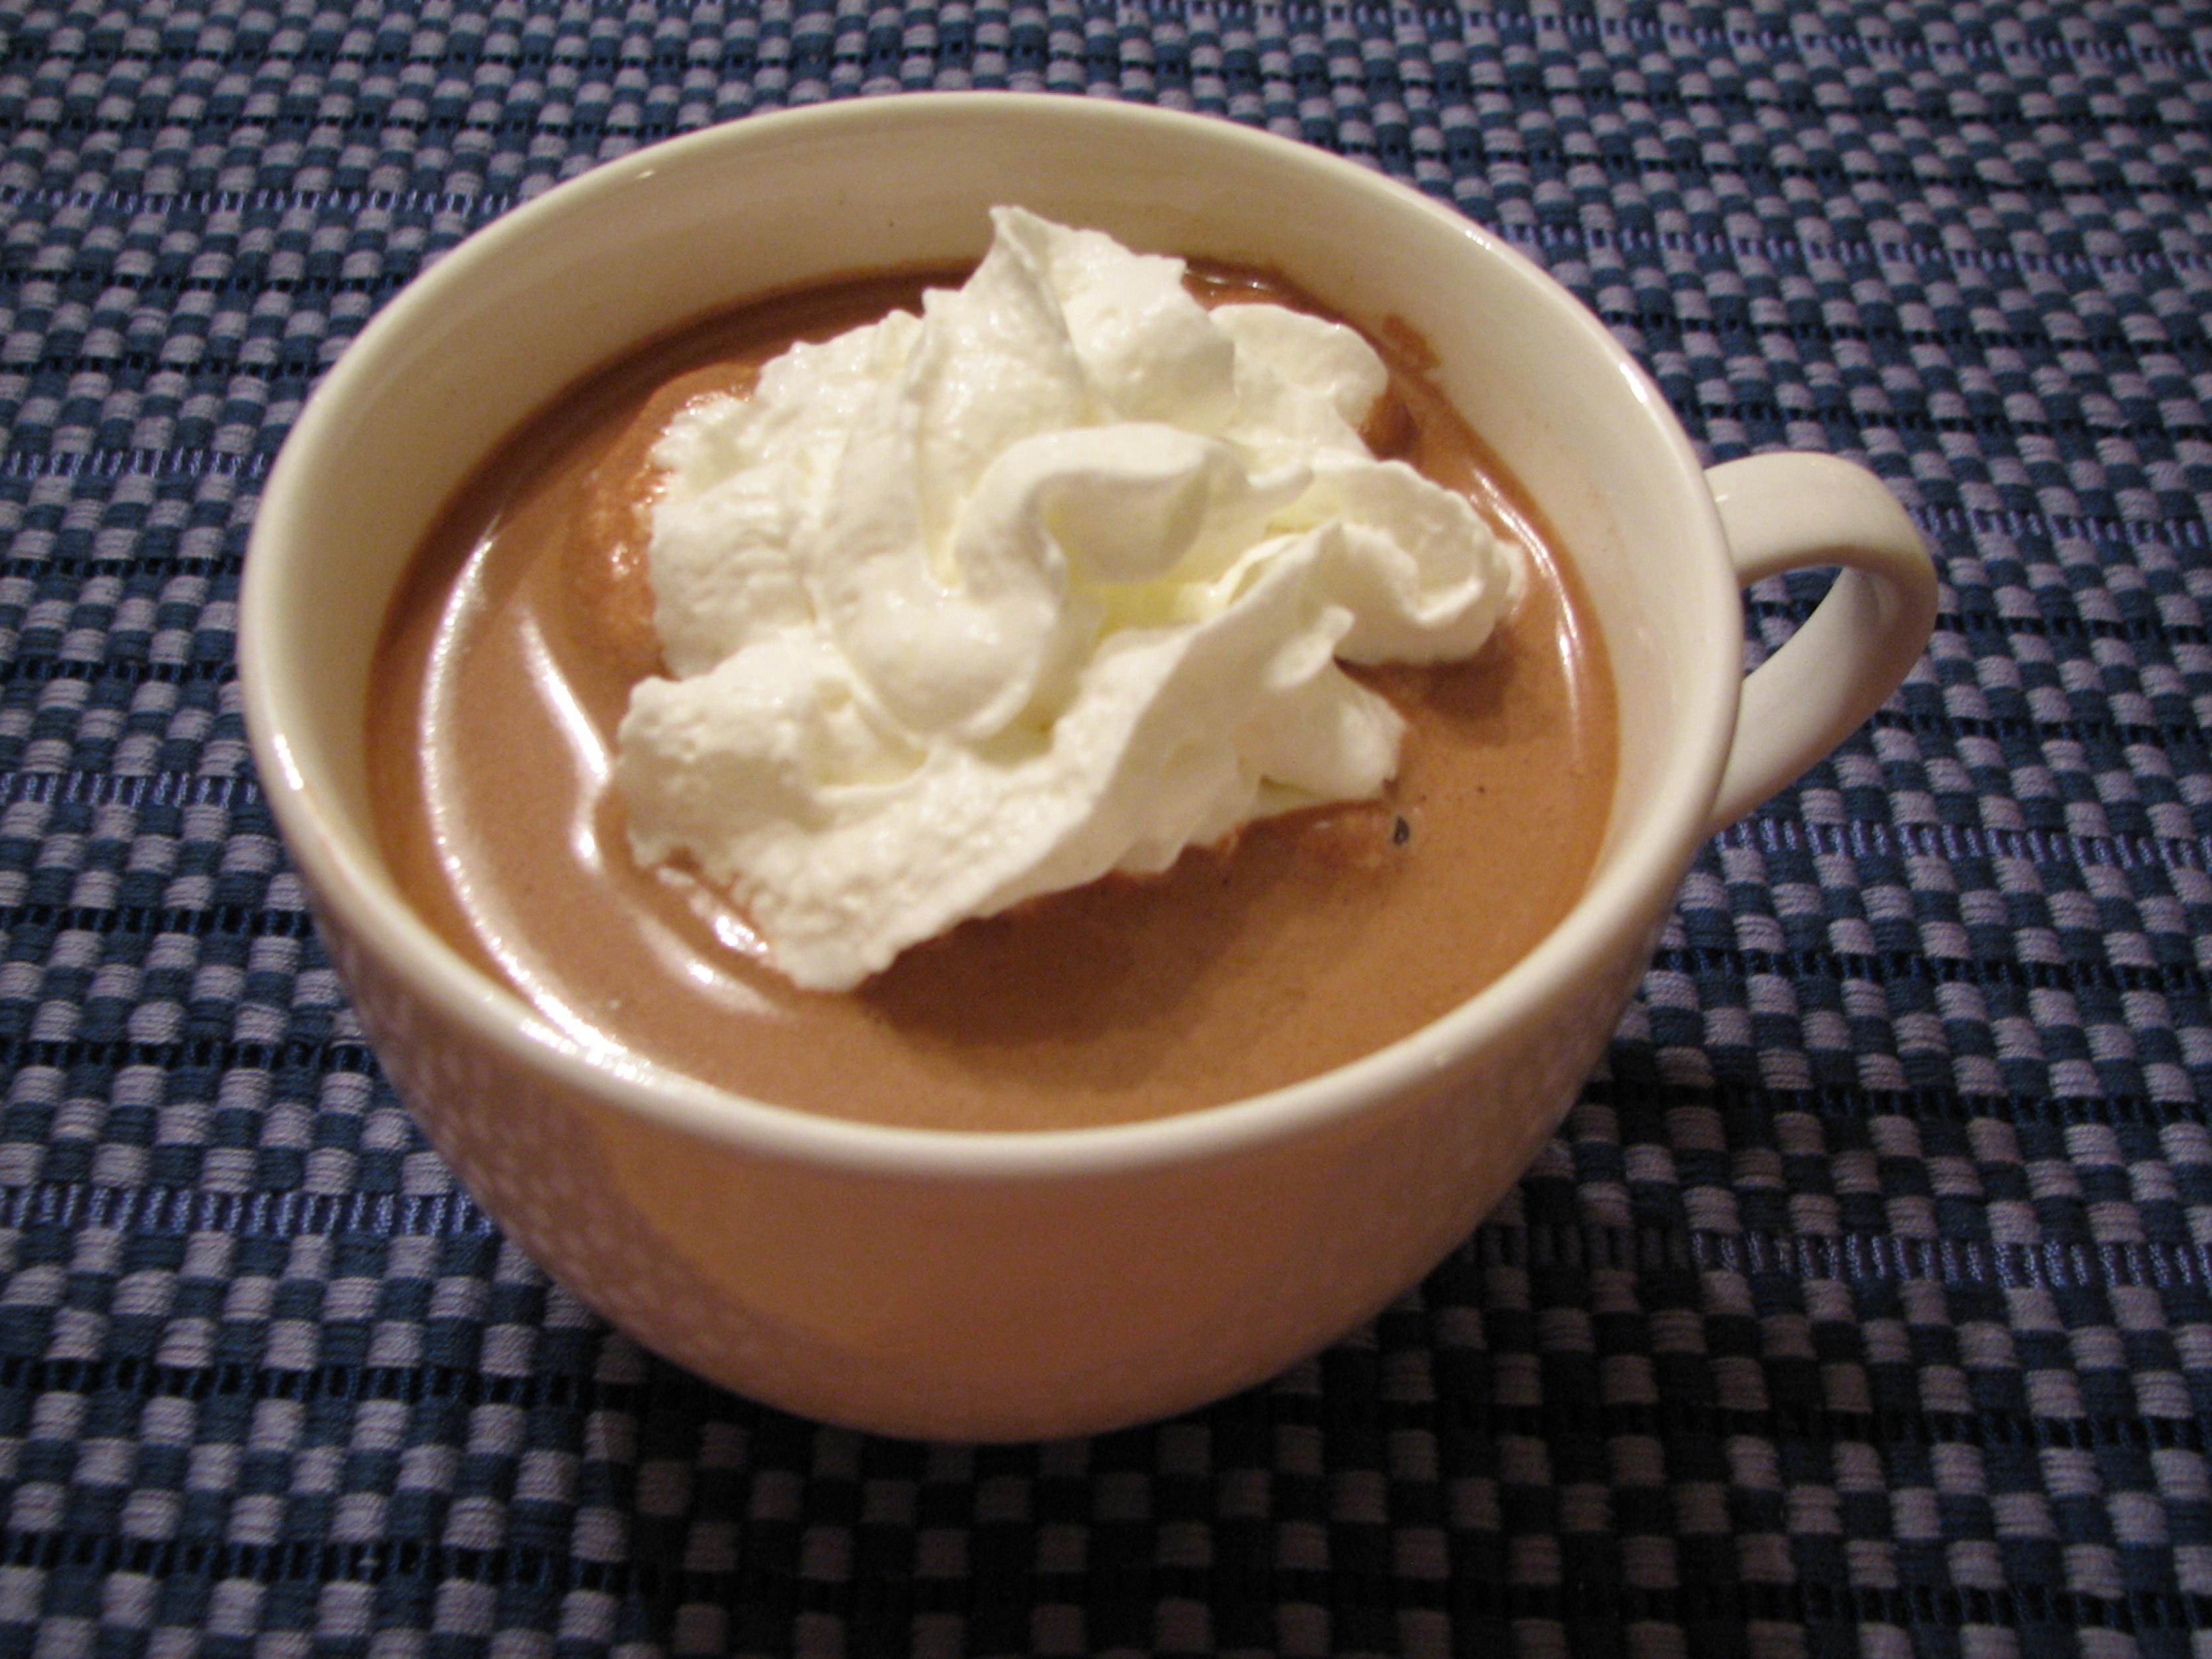 http://caffeineandaprayer.com/wp-content/uploads/2008/12/2008-12-05_hot-chocolate-mix_0022.jpg